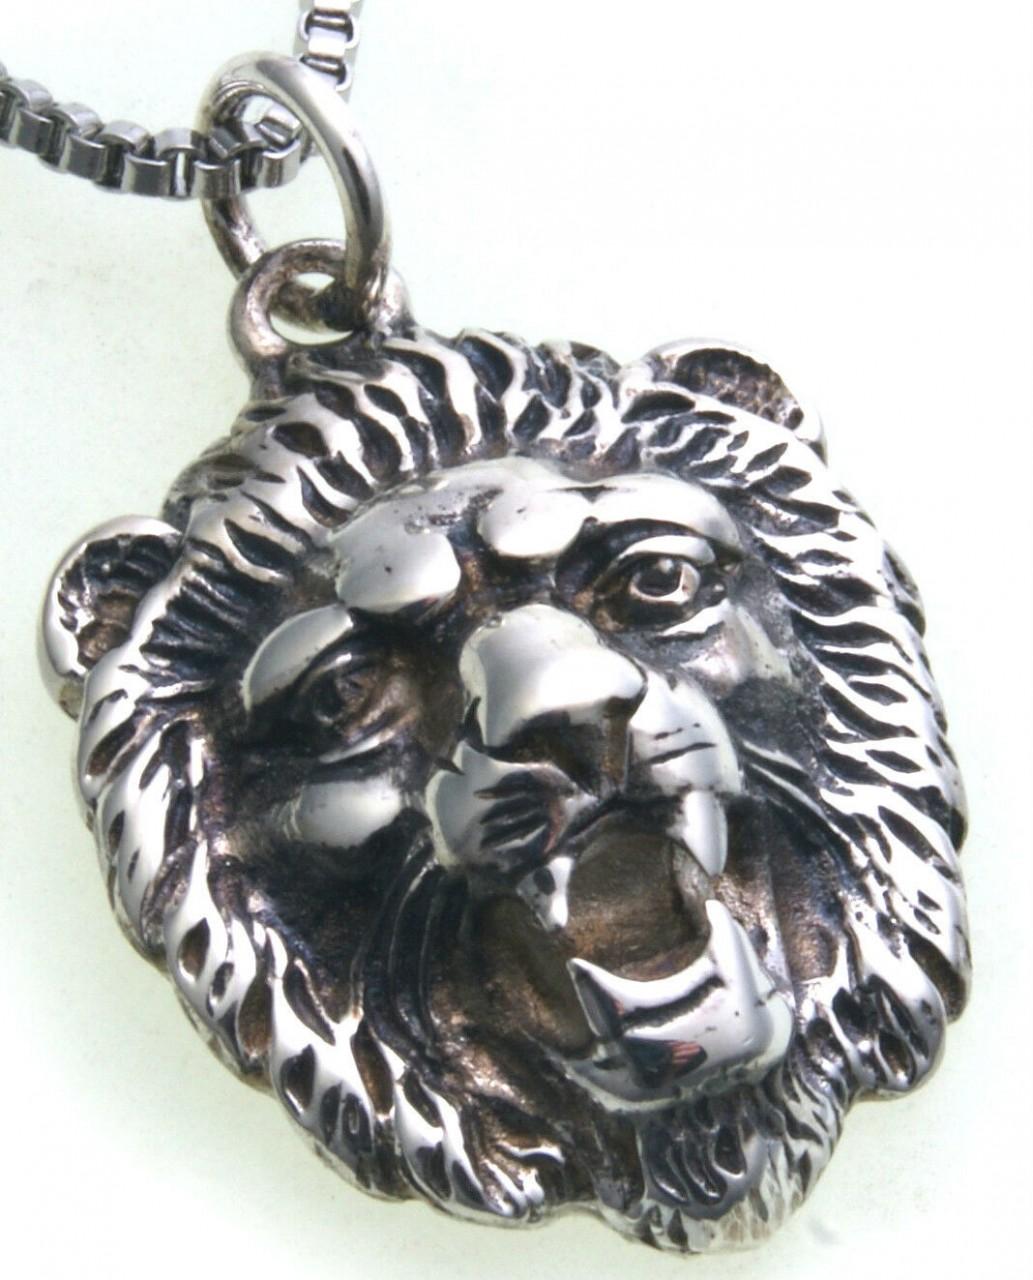 Anhänger Löwe Kopf echt Silber 925 Sterlingsilber Unisex Raubkatze Löwenkopf